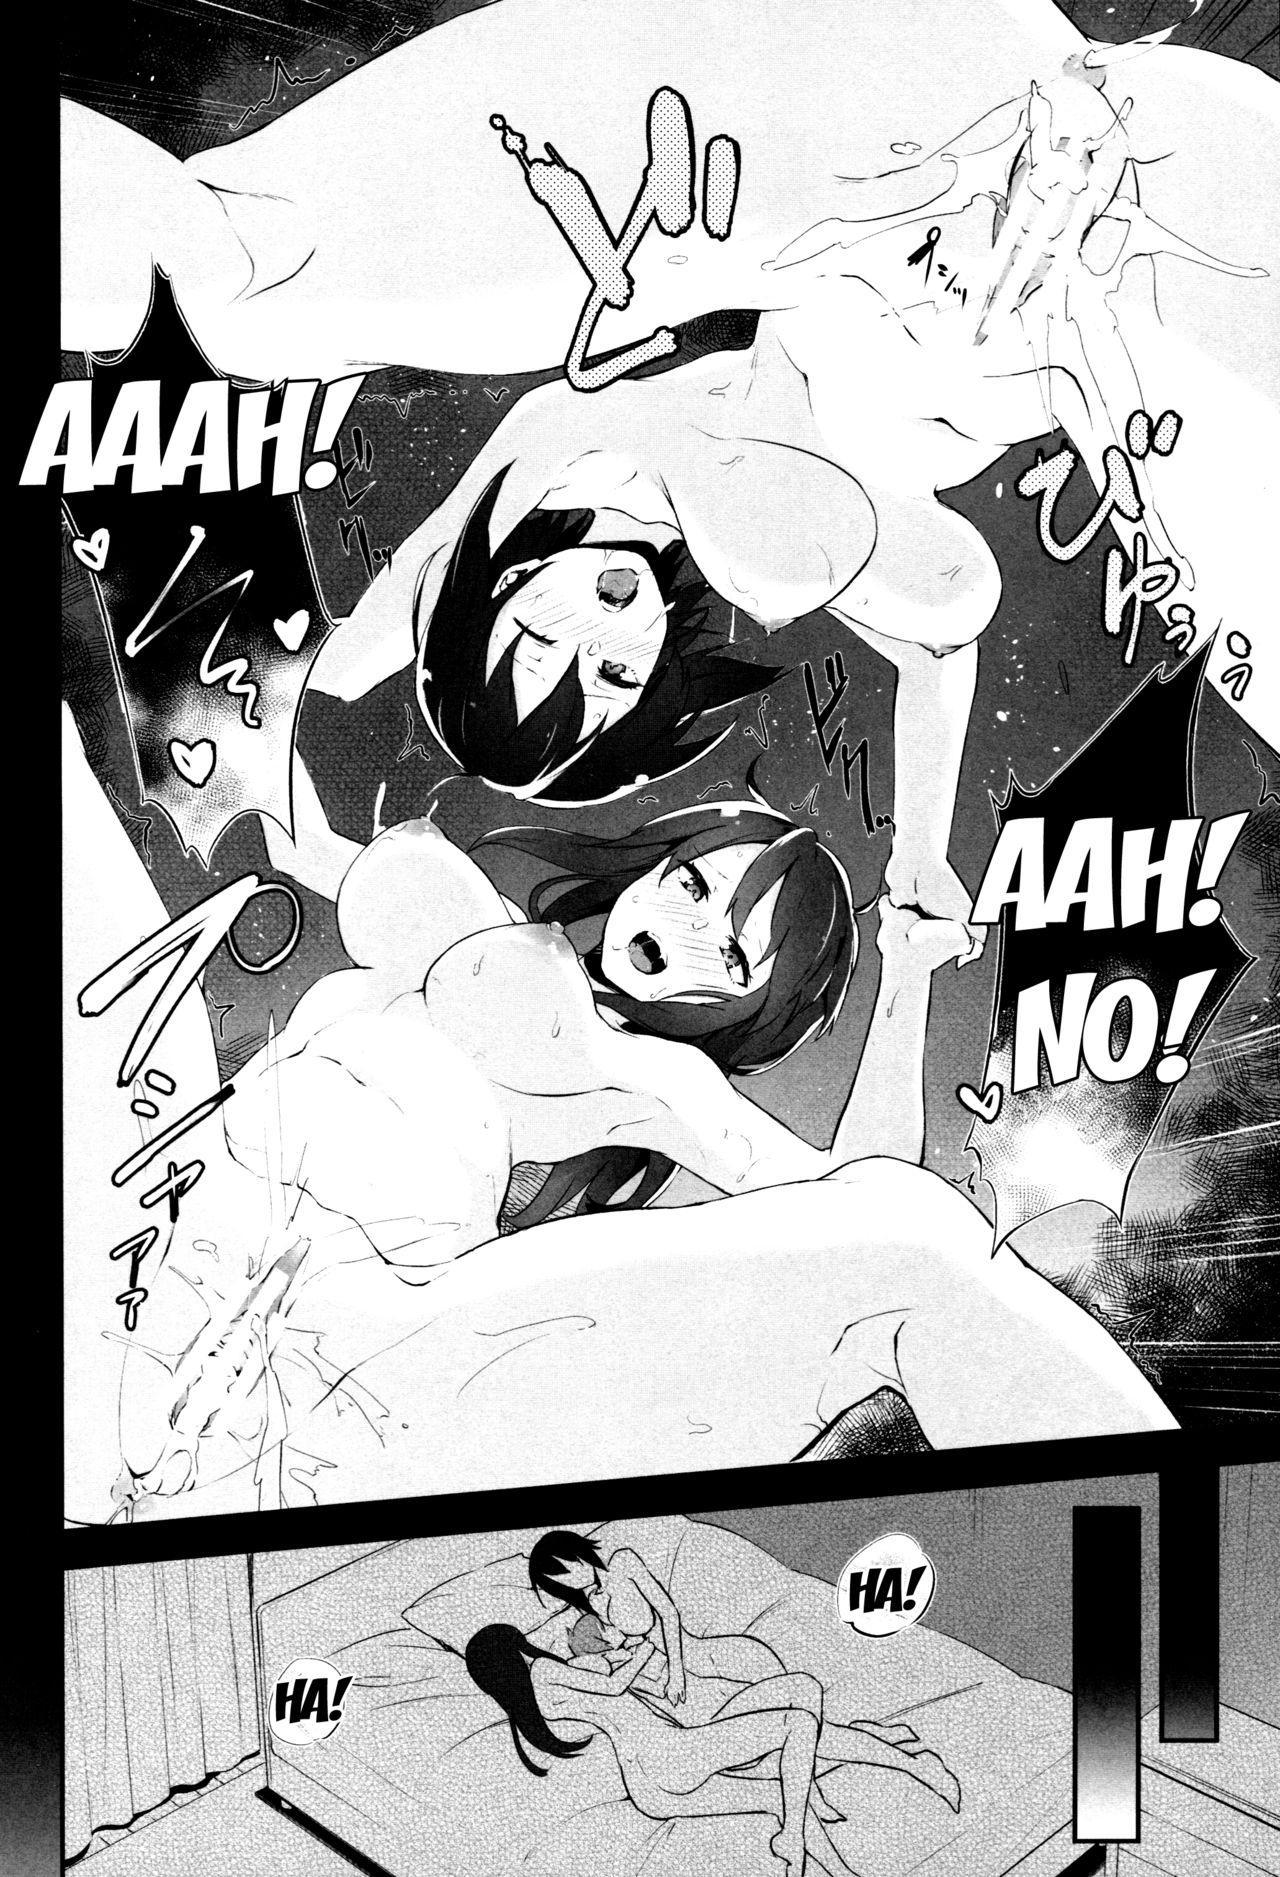 (C92) [Soda Batake (Muteki Soda)] Maho Mika Onee-san to Midara na Senshadou | Maho Mika Onee-san And The Lewd Tank Path (Girls und Panzer) [English] [Doujins.com] 17